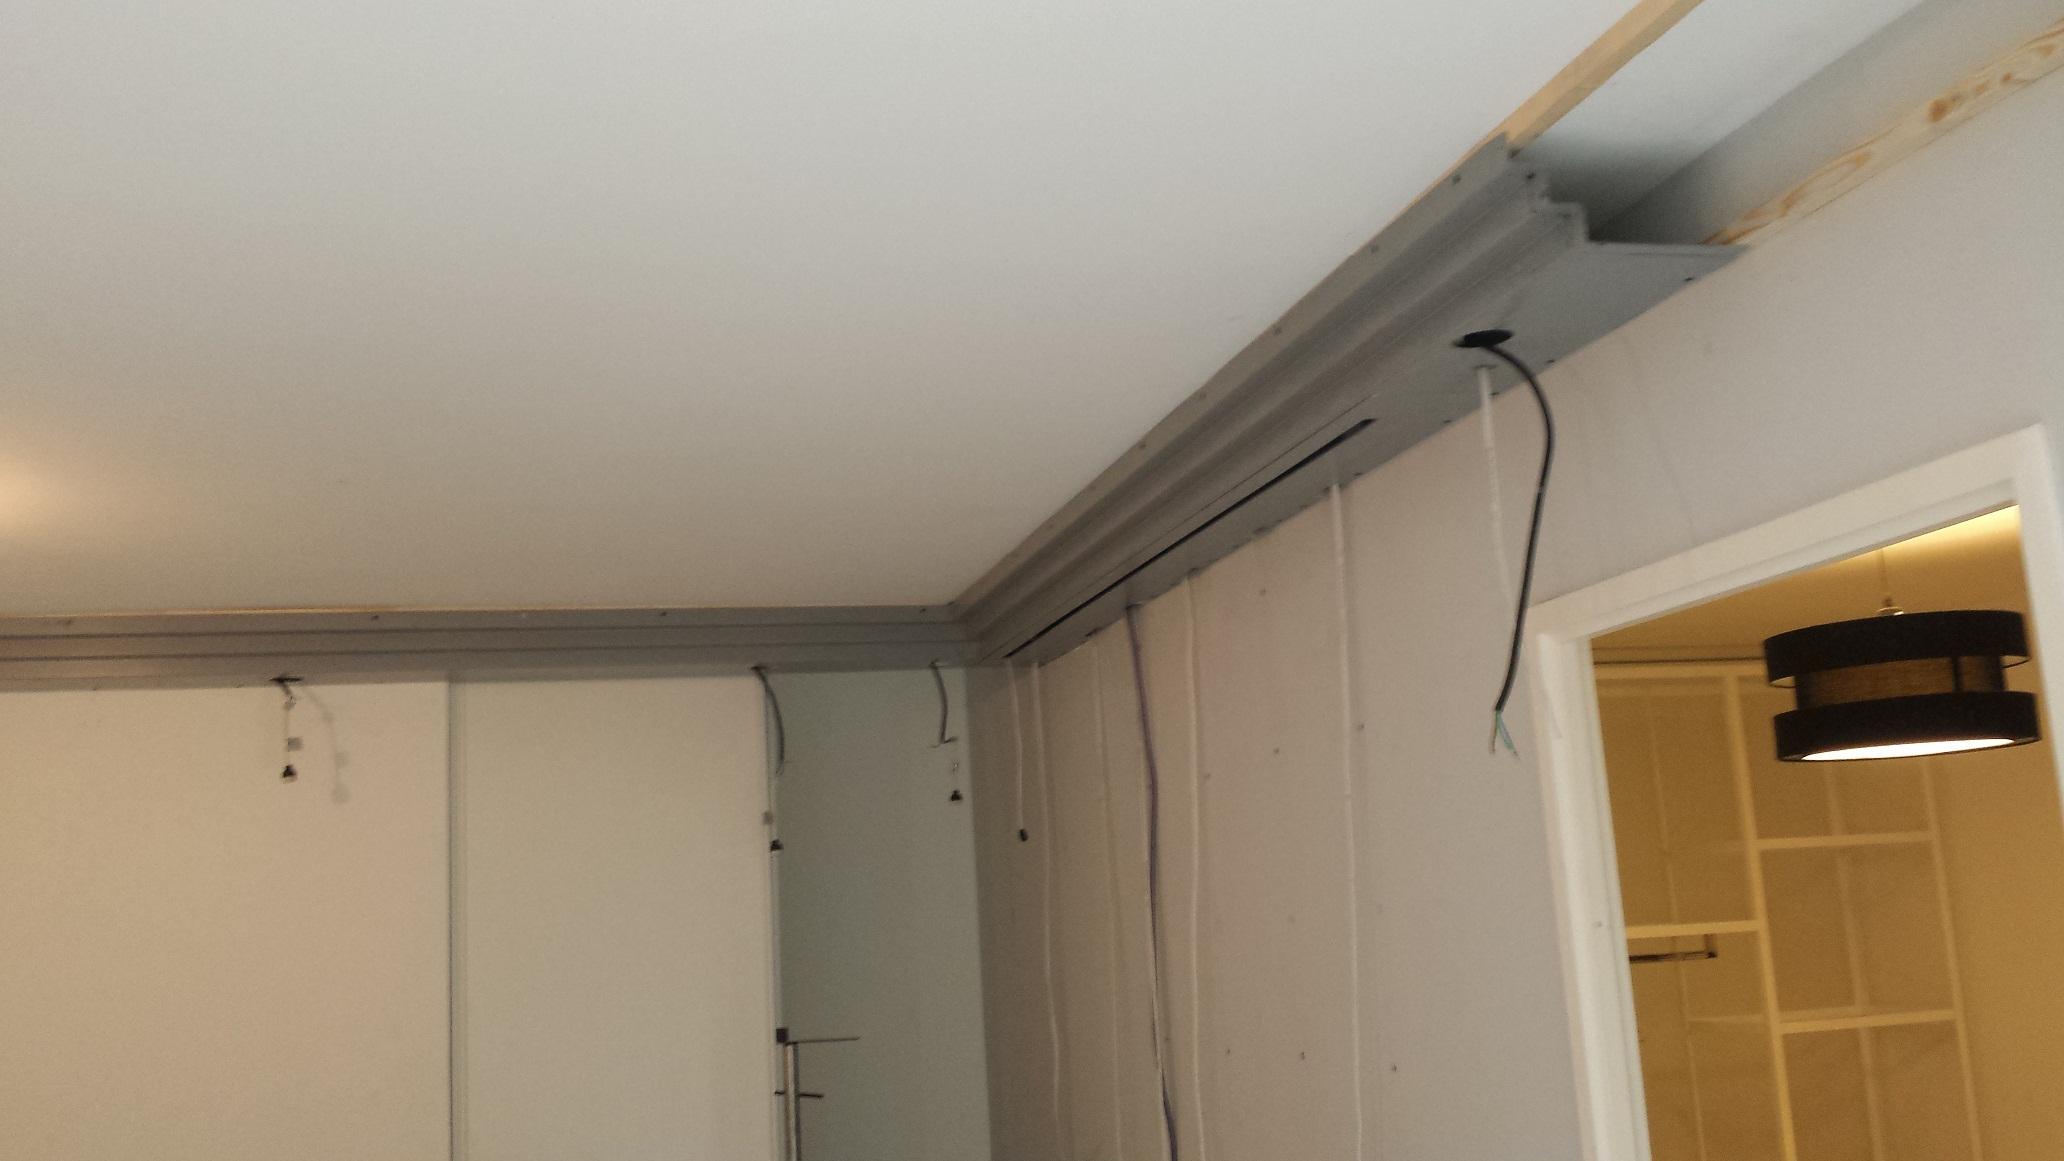 installation non d diees kmax 30039761 sur le forum installations hc non d di es 1215. Black Bedroom Furniture Sets. Home Design Ideas